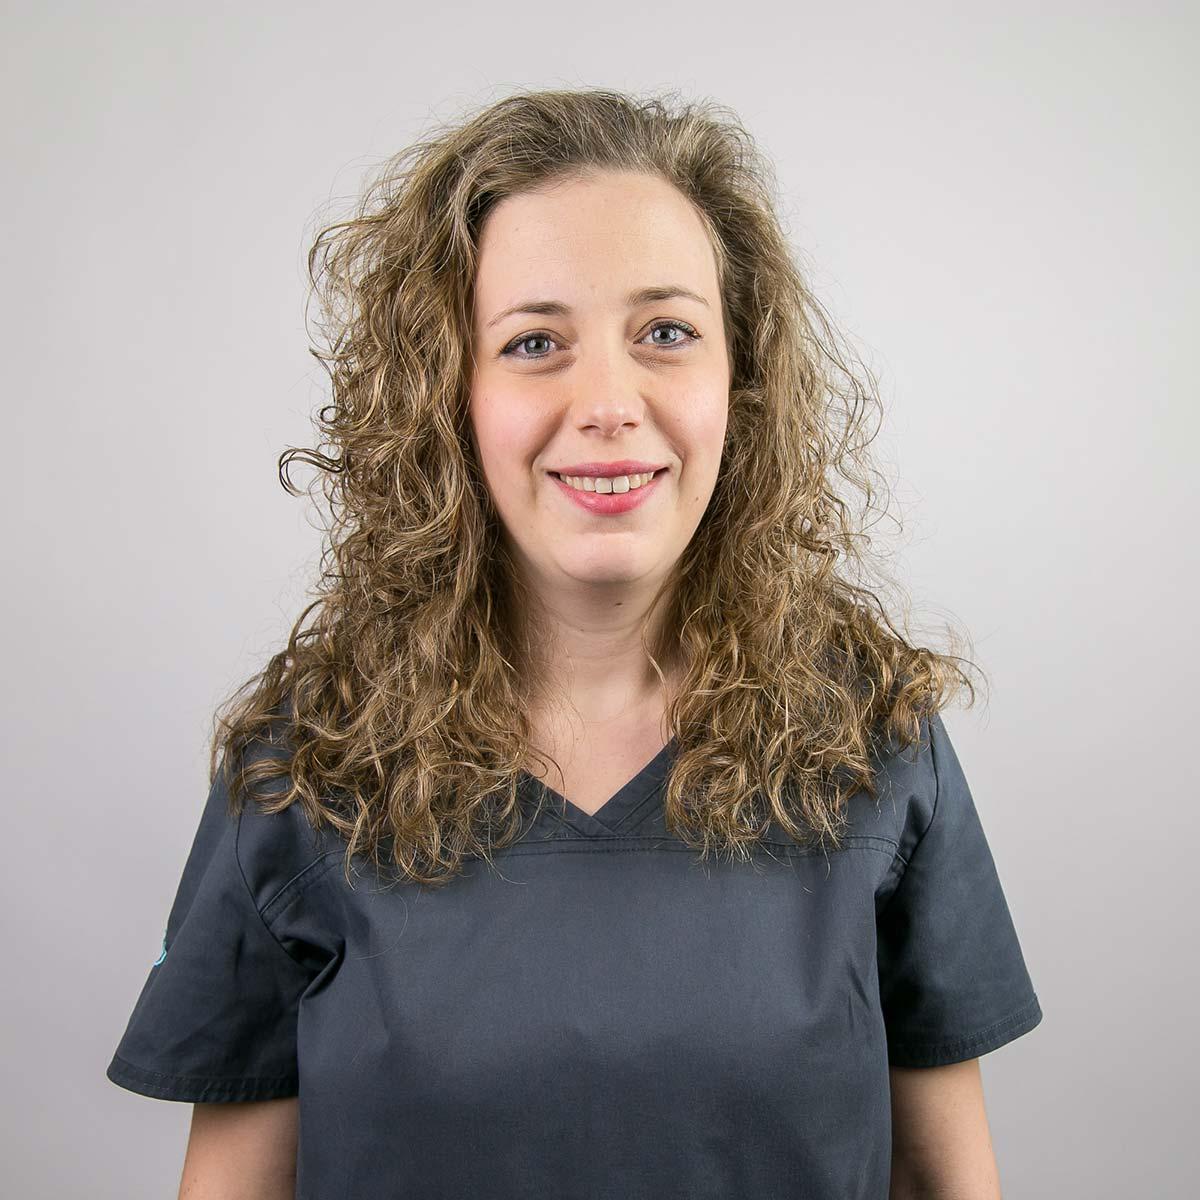 JESSICA ACOSTA - Atenció pacient - Auxiliar dental